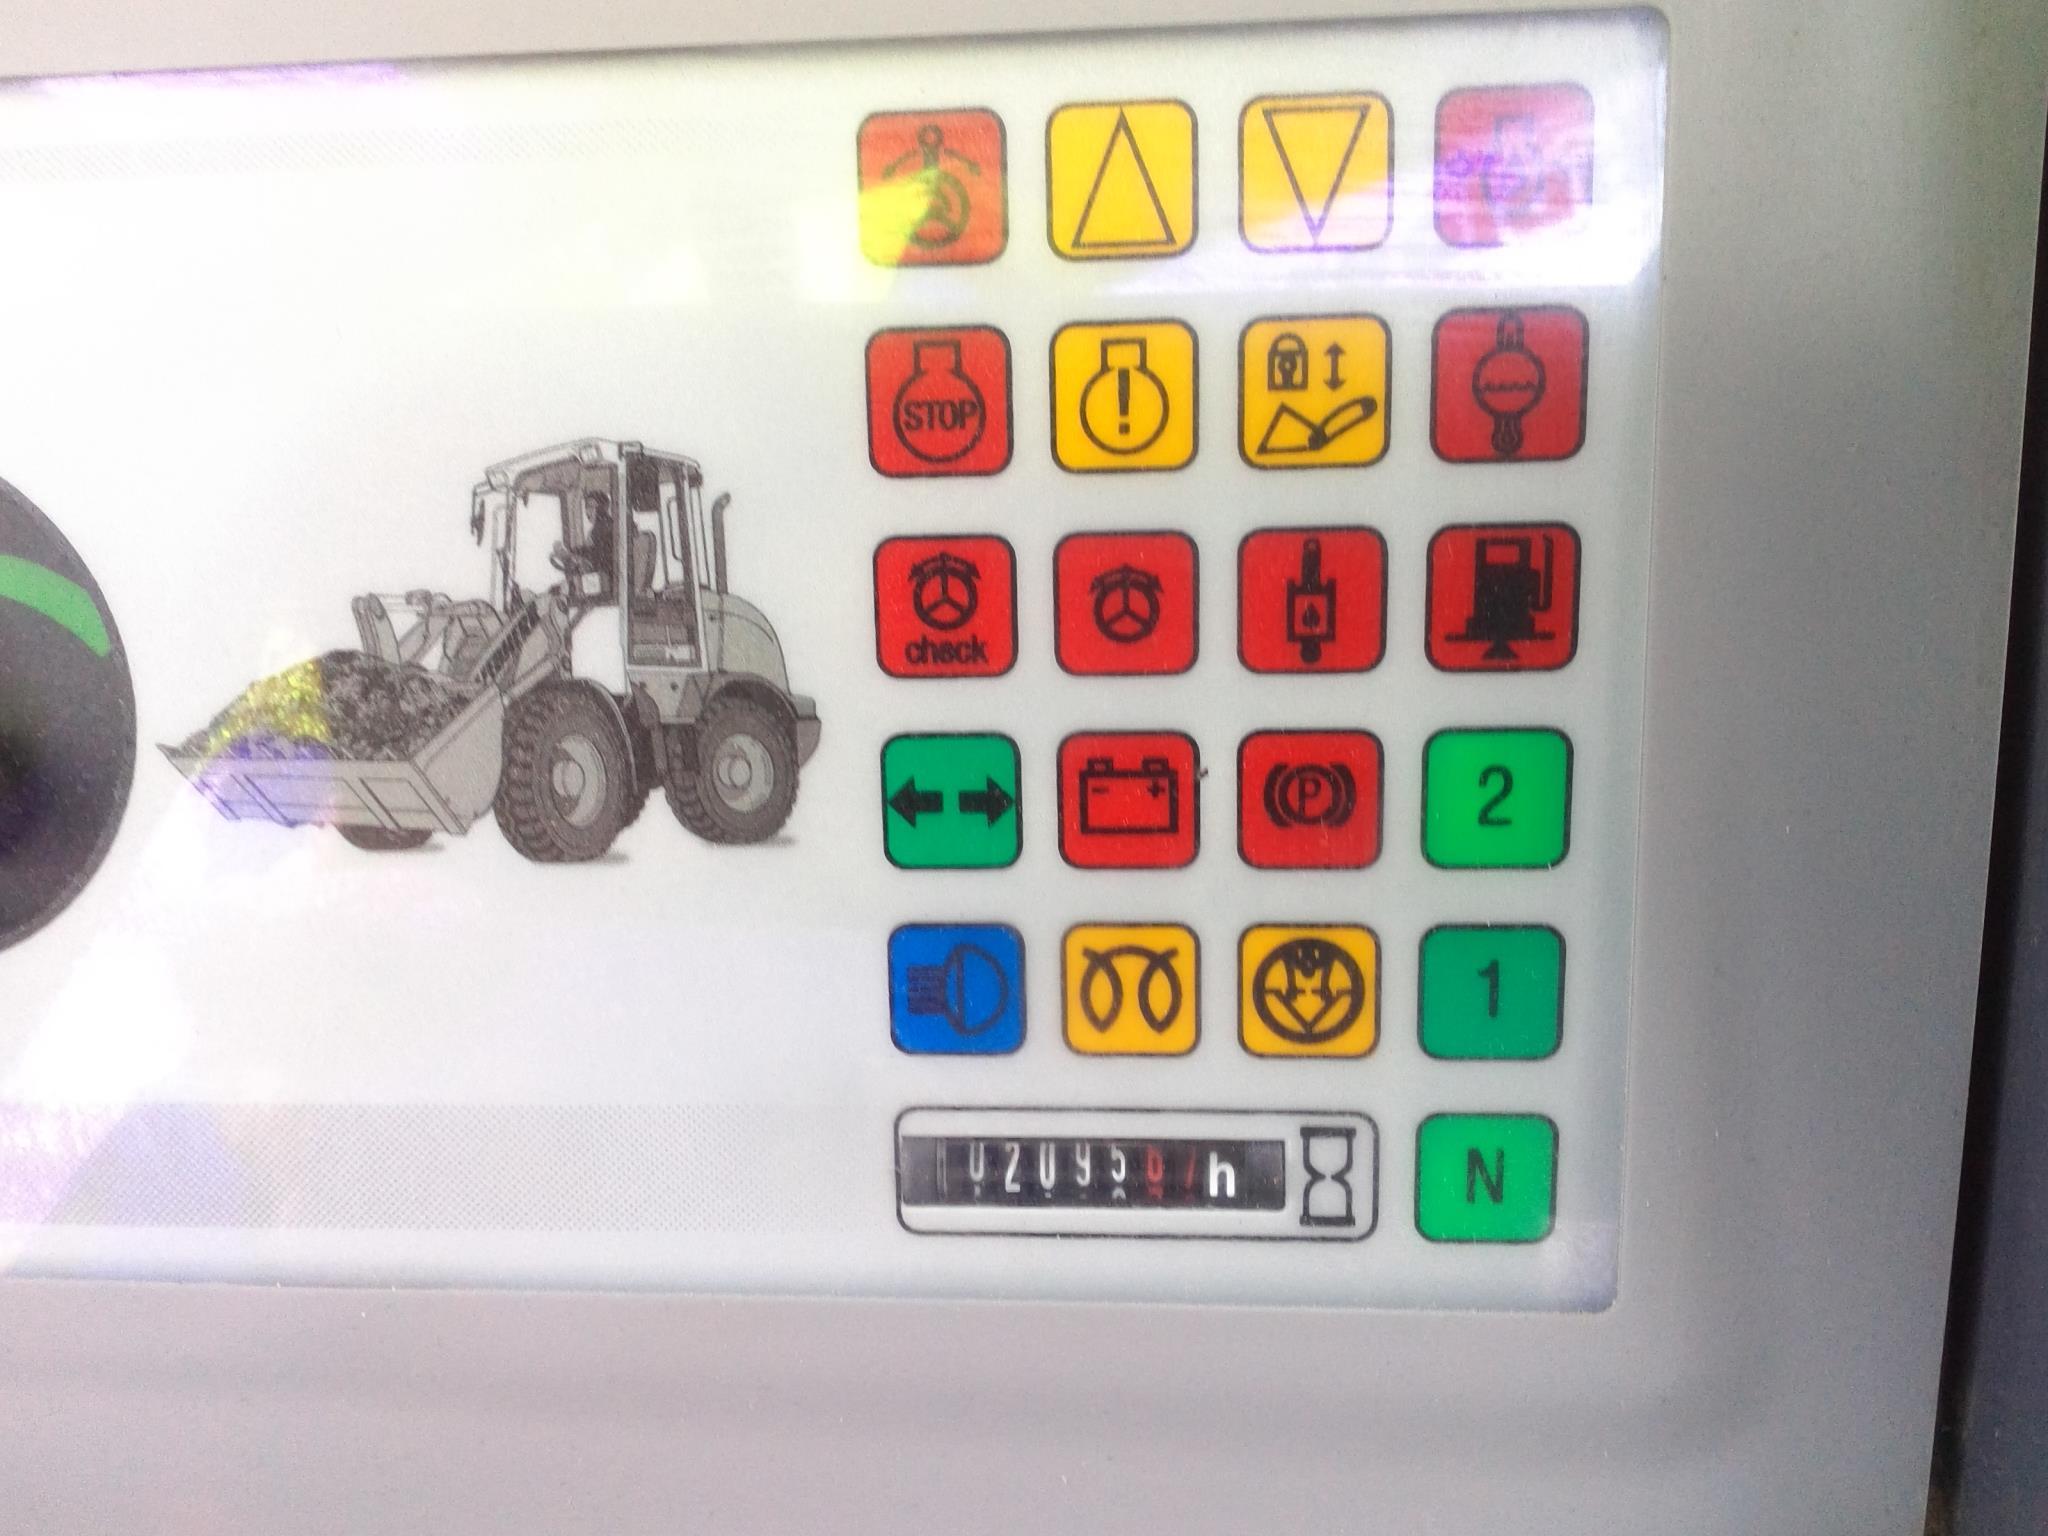 a31e0e44-5af7-4cd8-a04f-8f4292e16fb8_machine_9.jpg